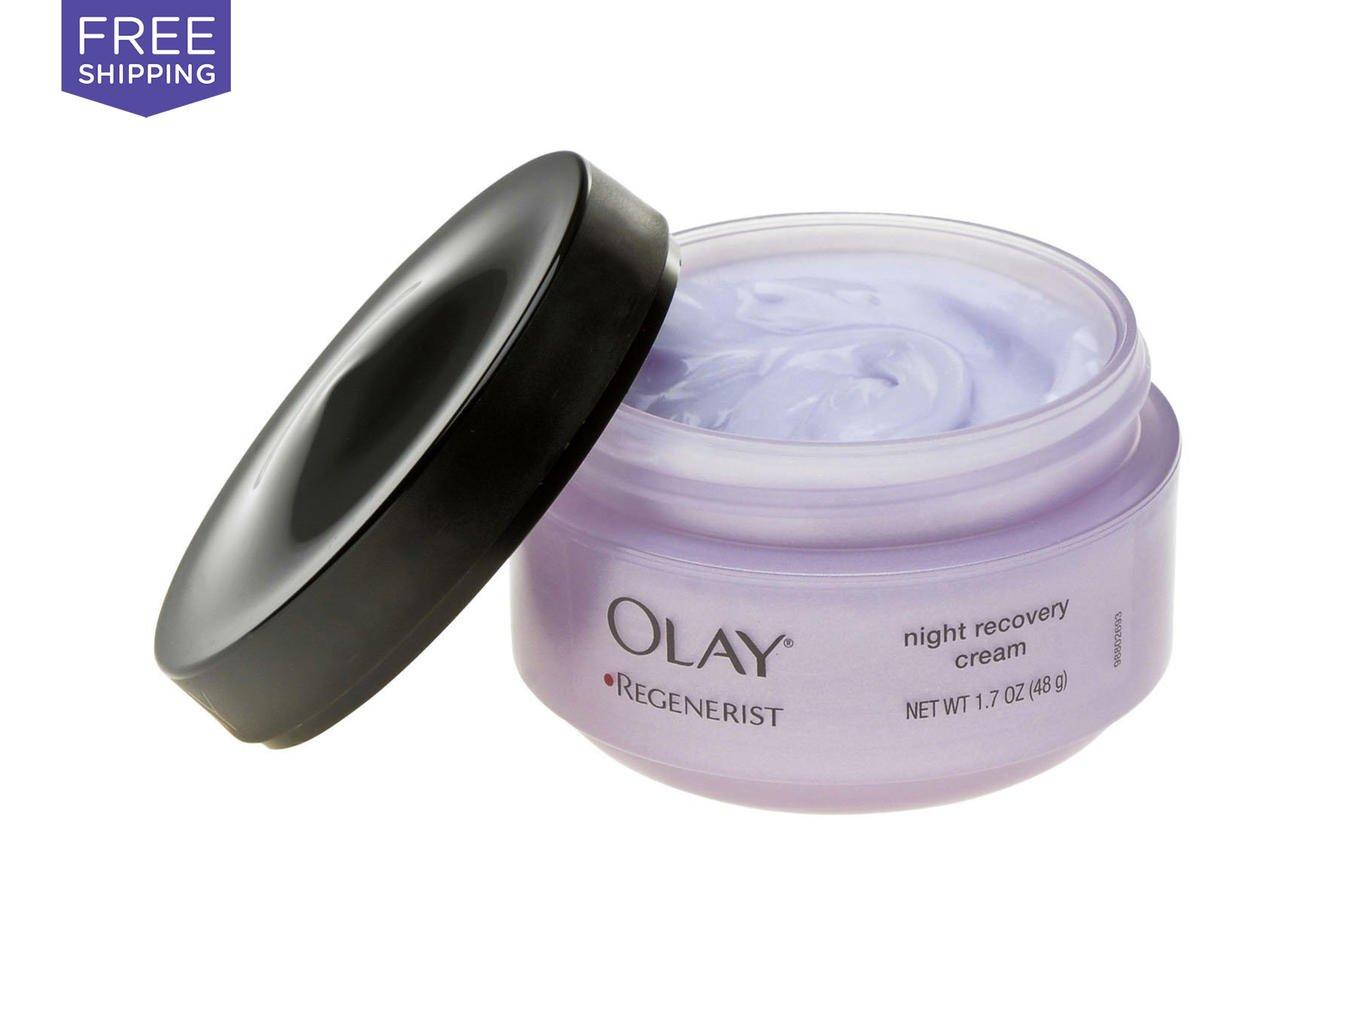 Olay Regenerist Regenerating Night Recovery Moisturizer Cream 1.7 Oz